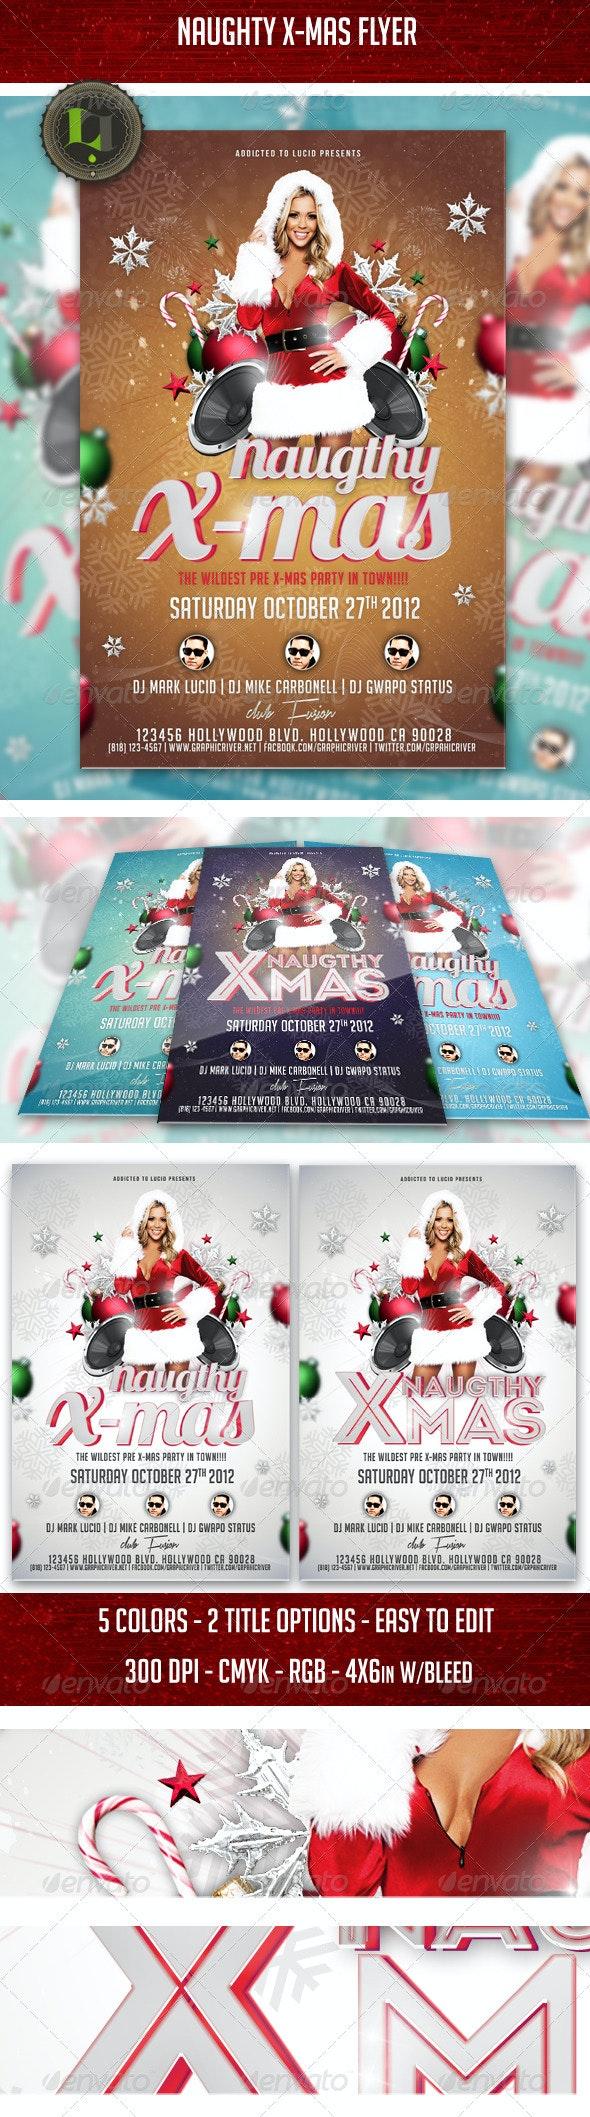 Naugthy X Mas Flyer  - Holidays Events